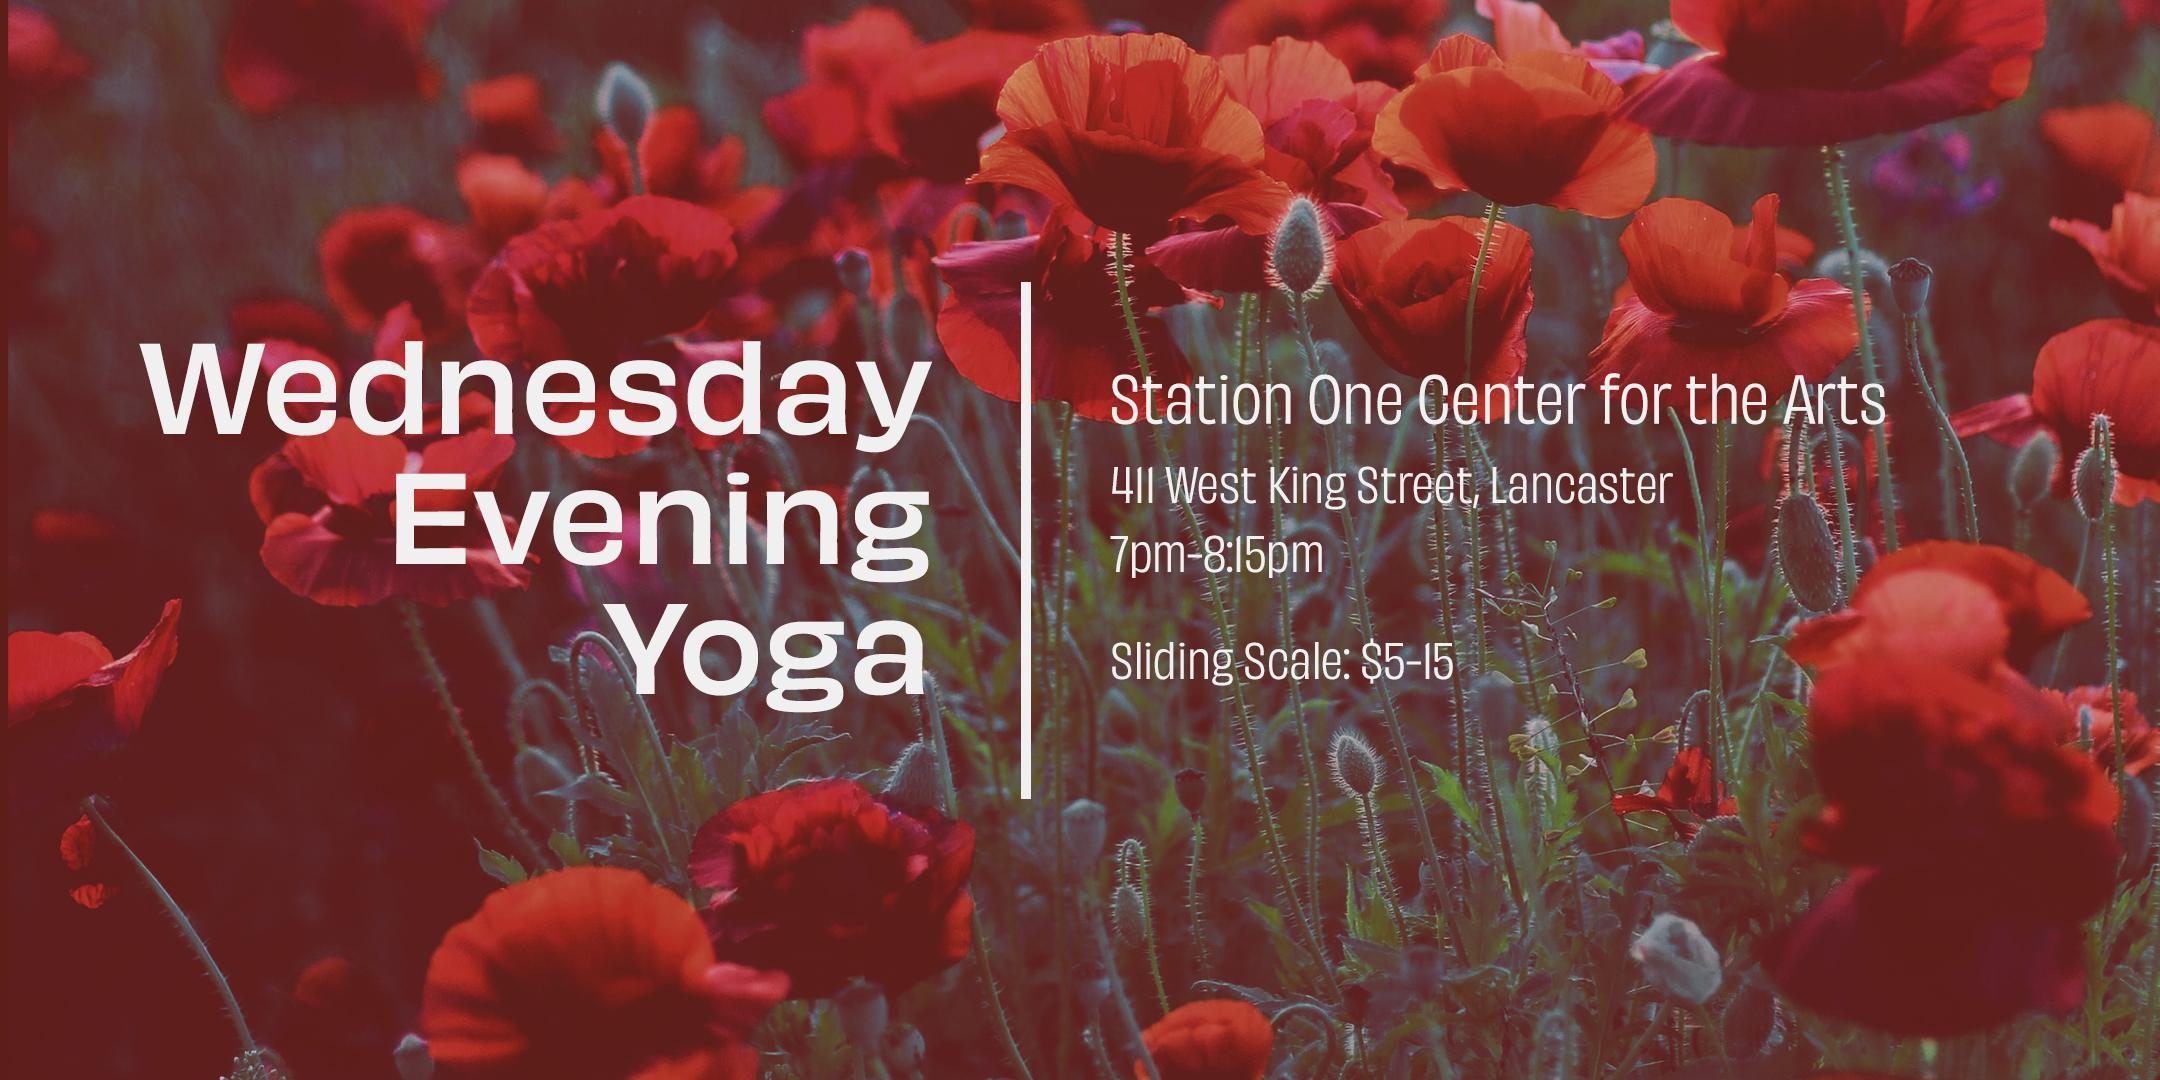 Wednesday Evening Community Yoga